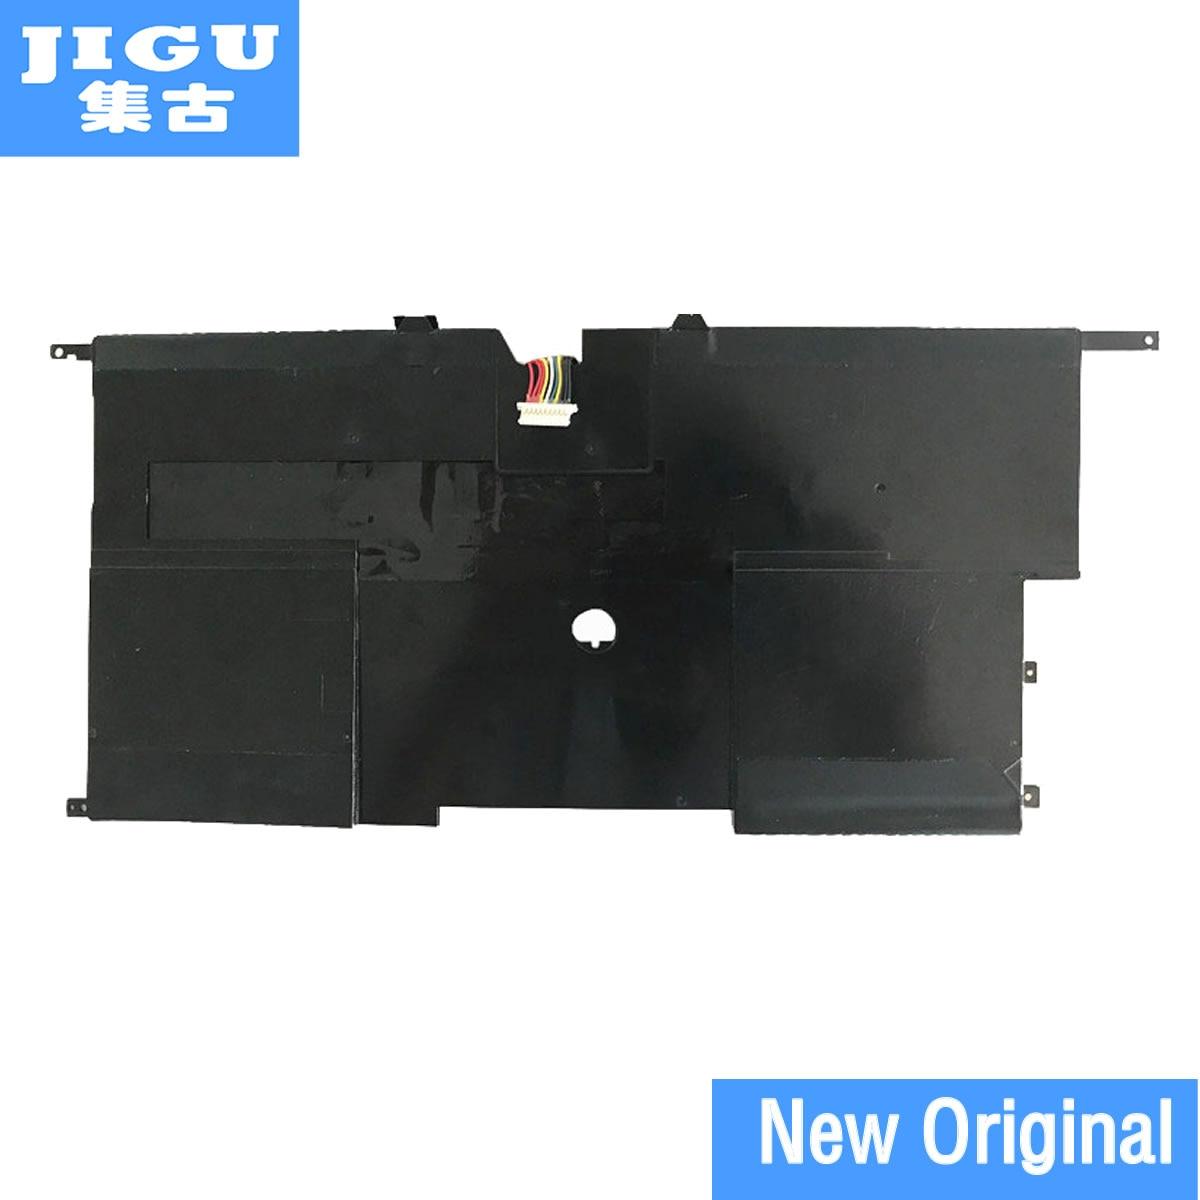 JIGU Original laptop Battery 45N1700 45N1701 FOR LENOVO FOR ThinkPad X1 Carbon new original 14 8v 46wh laptop battery for lenovo thinkpad x1 carbon gen 1 3444 3448 3460 45n1070 45n1071